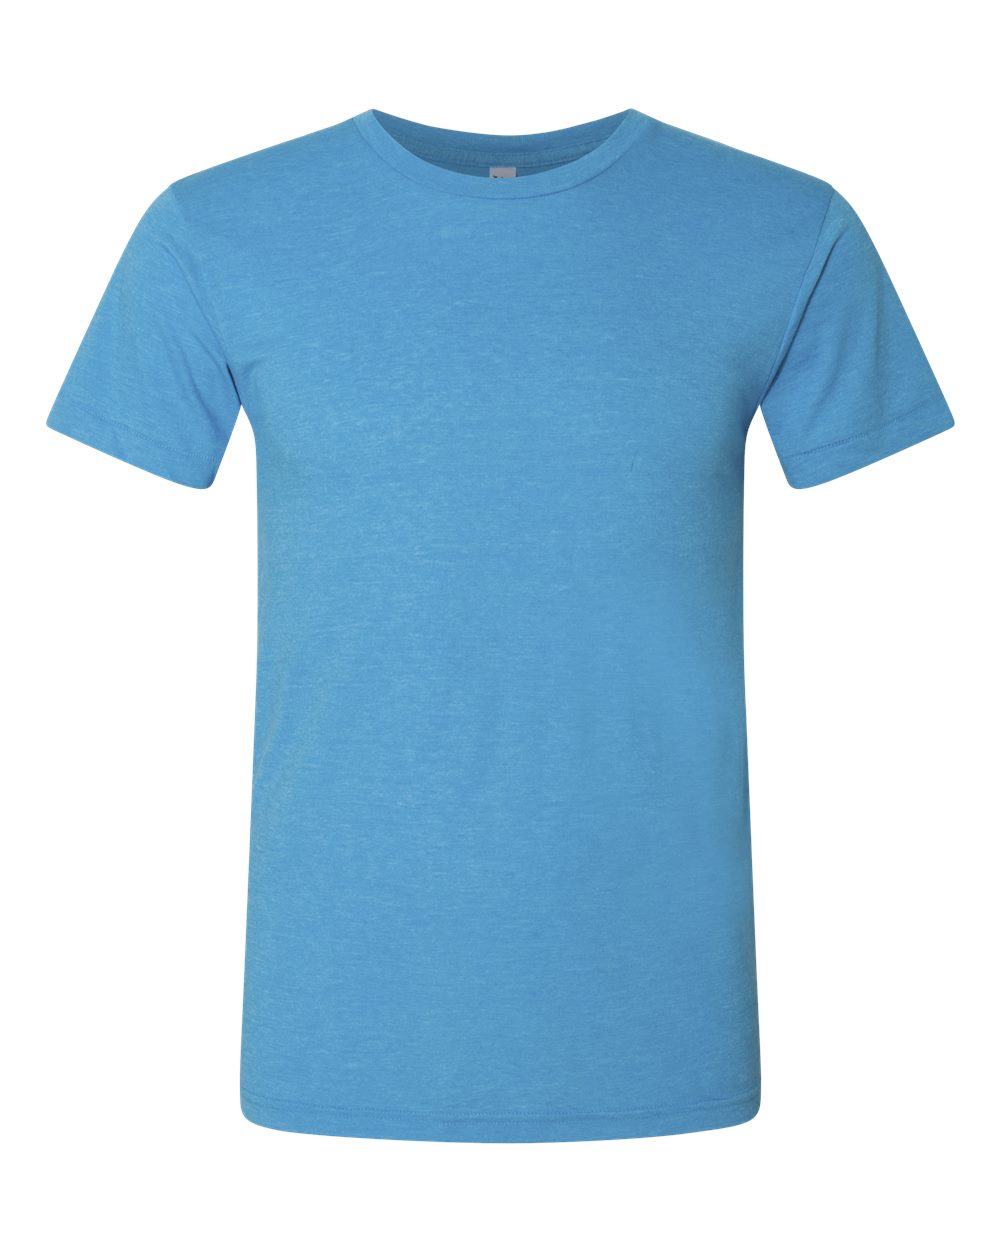 American-Apparel-Mens-Slim-Fit-50-50-Cotton-T-Shirt-Tee-BB401W-up-to-2XL thumbnail 45